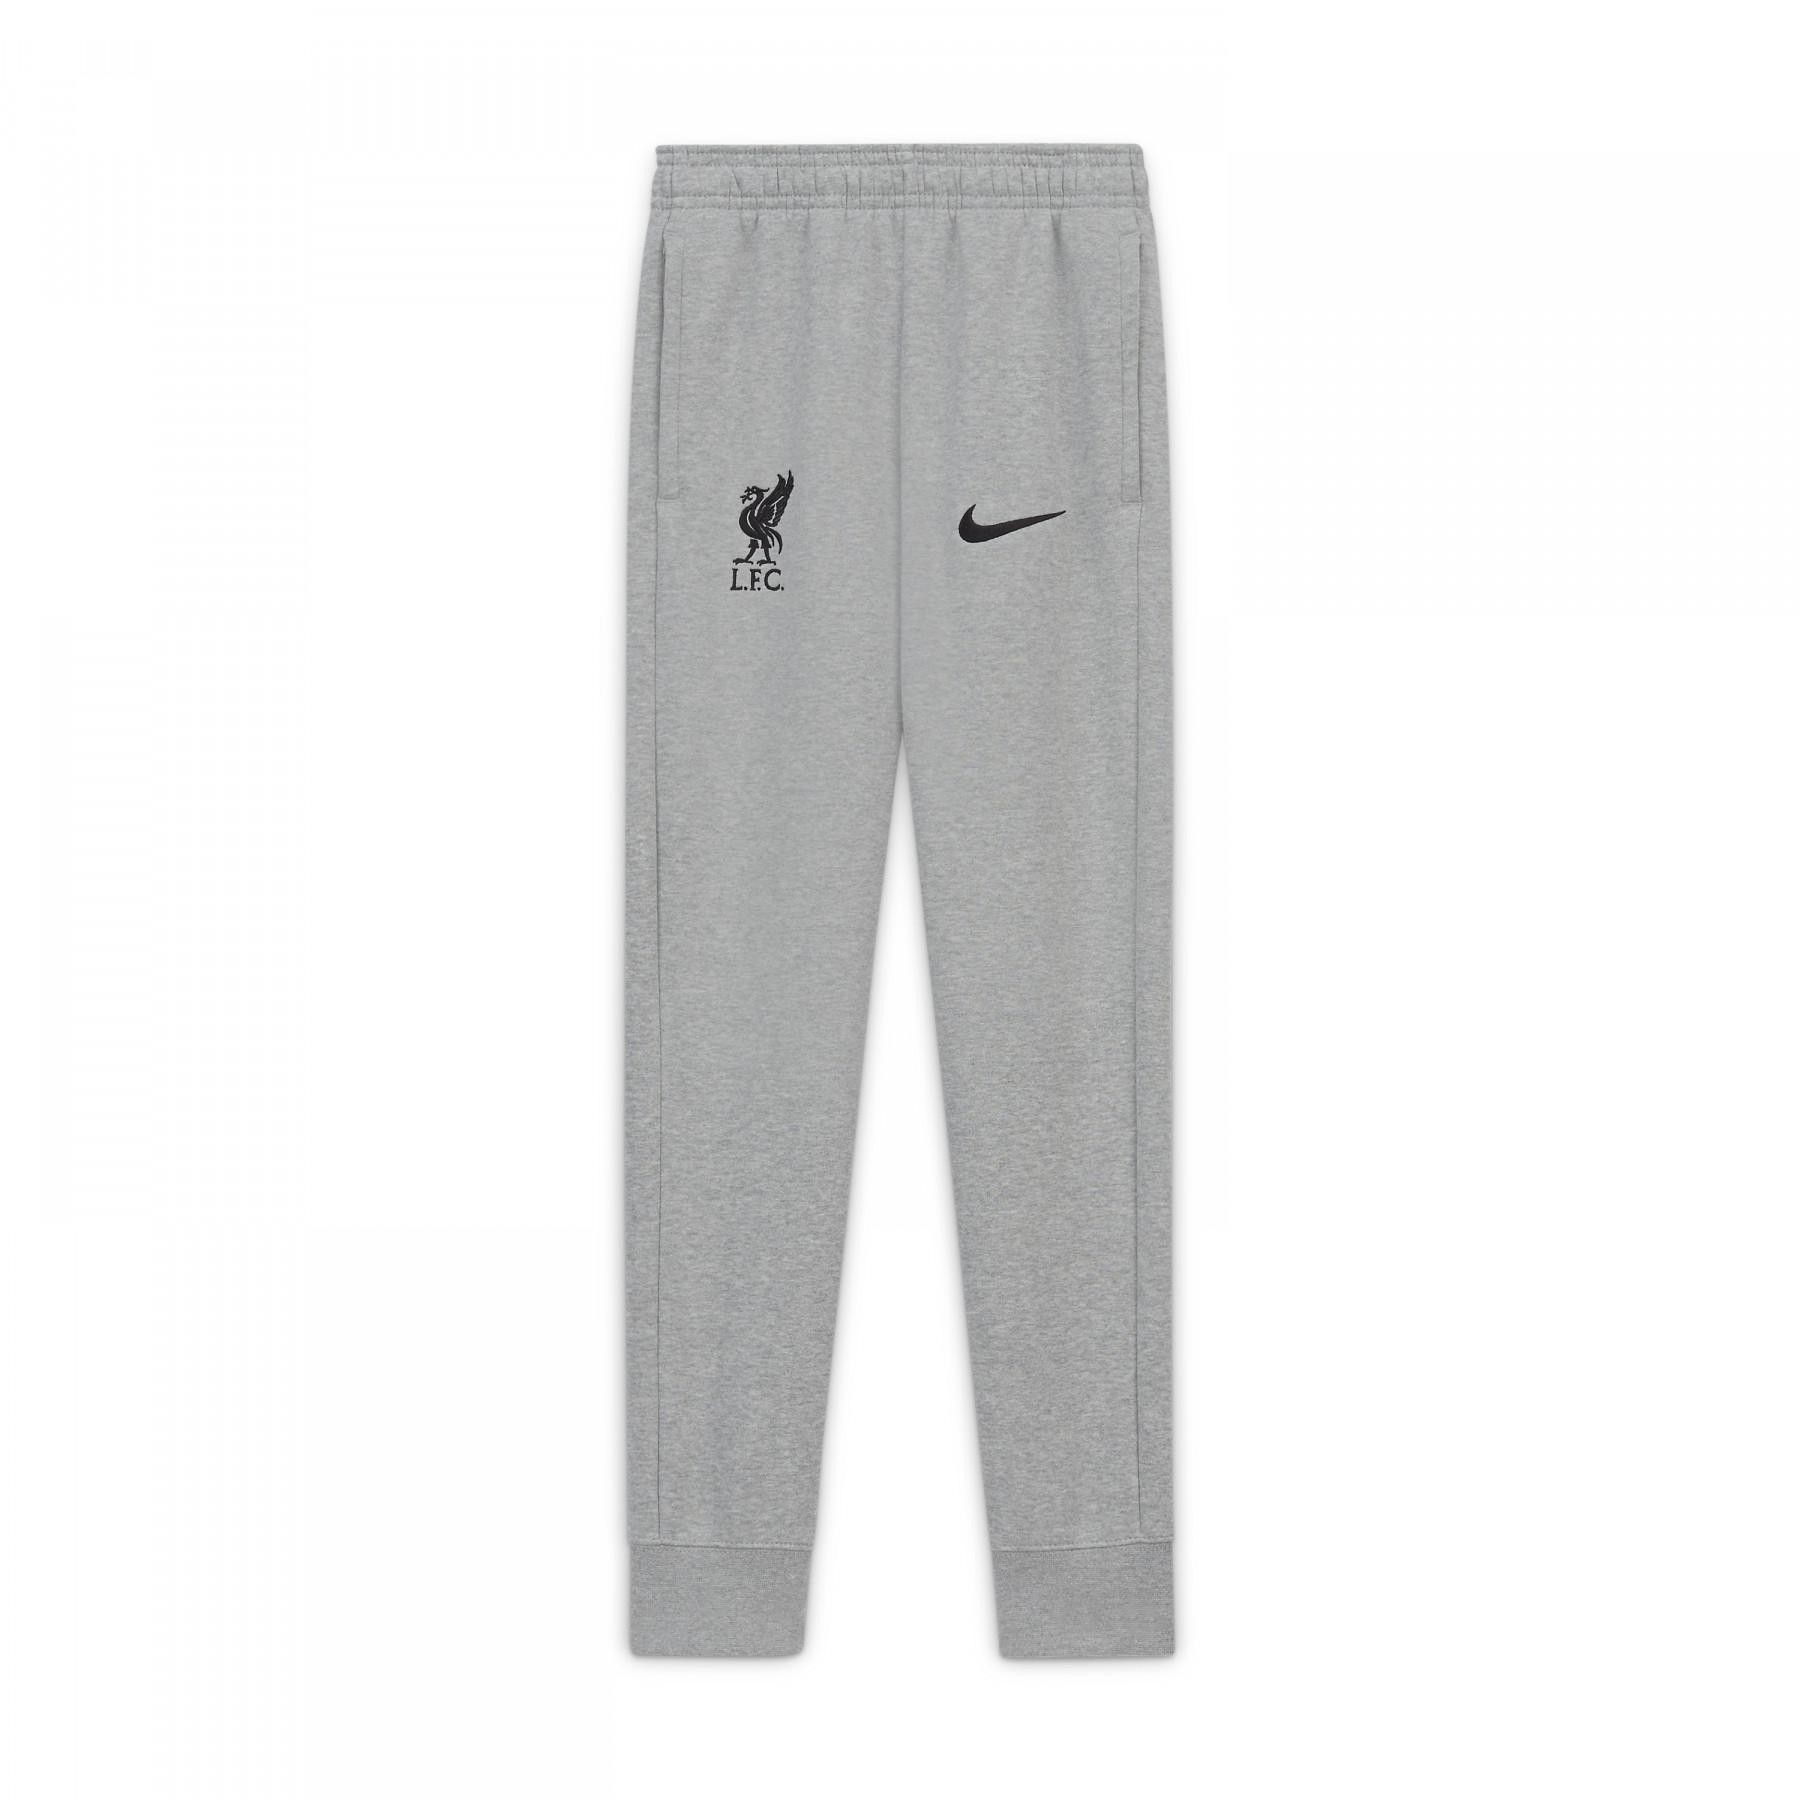 Junior Liverpool 2020/21 Dry Pants